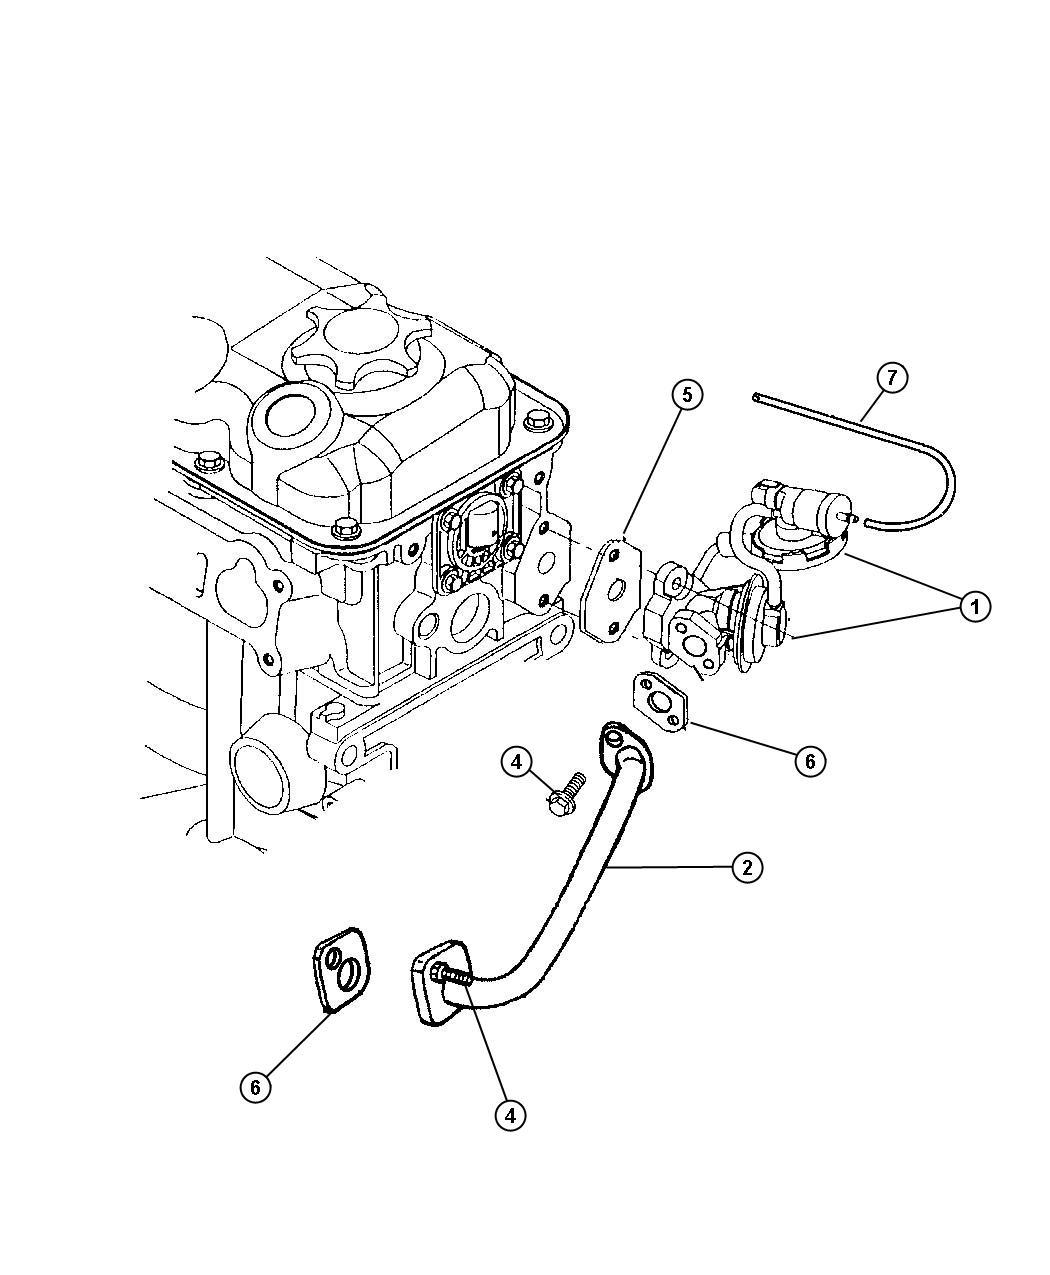 Dodge Neon 2.0L I4 DOHC 16V SMPI, 3-Speed Automatic EGR